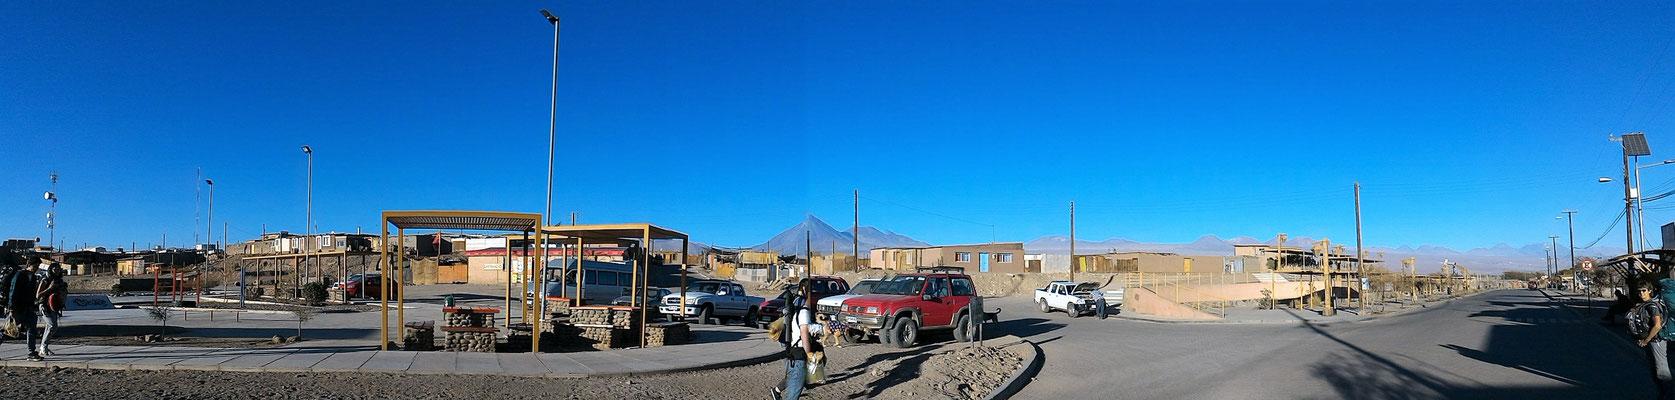 PANORAMIQUE VOLCAN LICANCABUR 5916 M ET VILLAGE DE SAN PEDRO DE ATACAMA CHILI